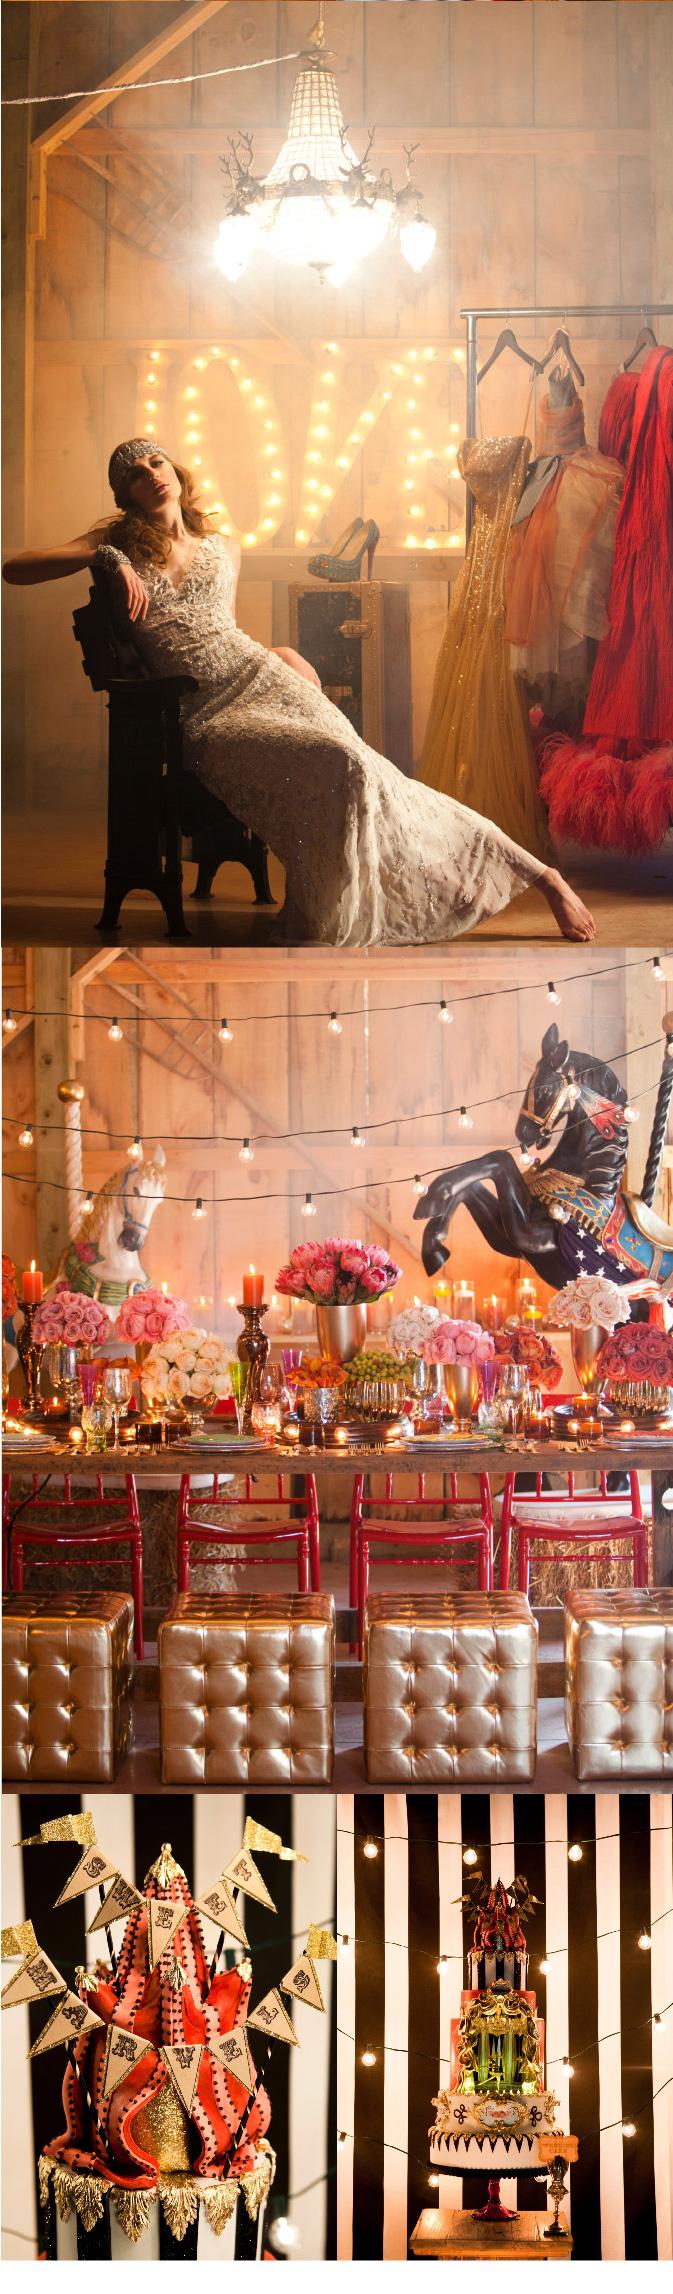 Amazing Circus Themed Wedding Inspiration